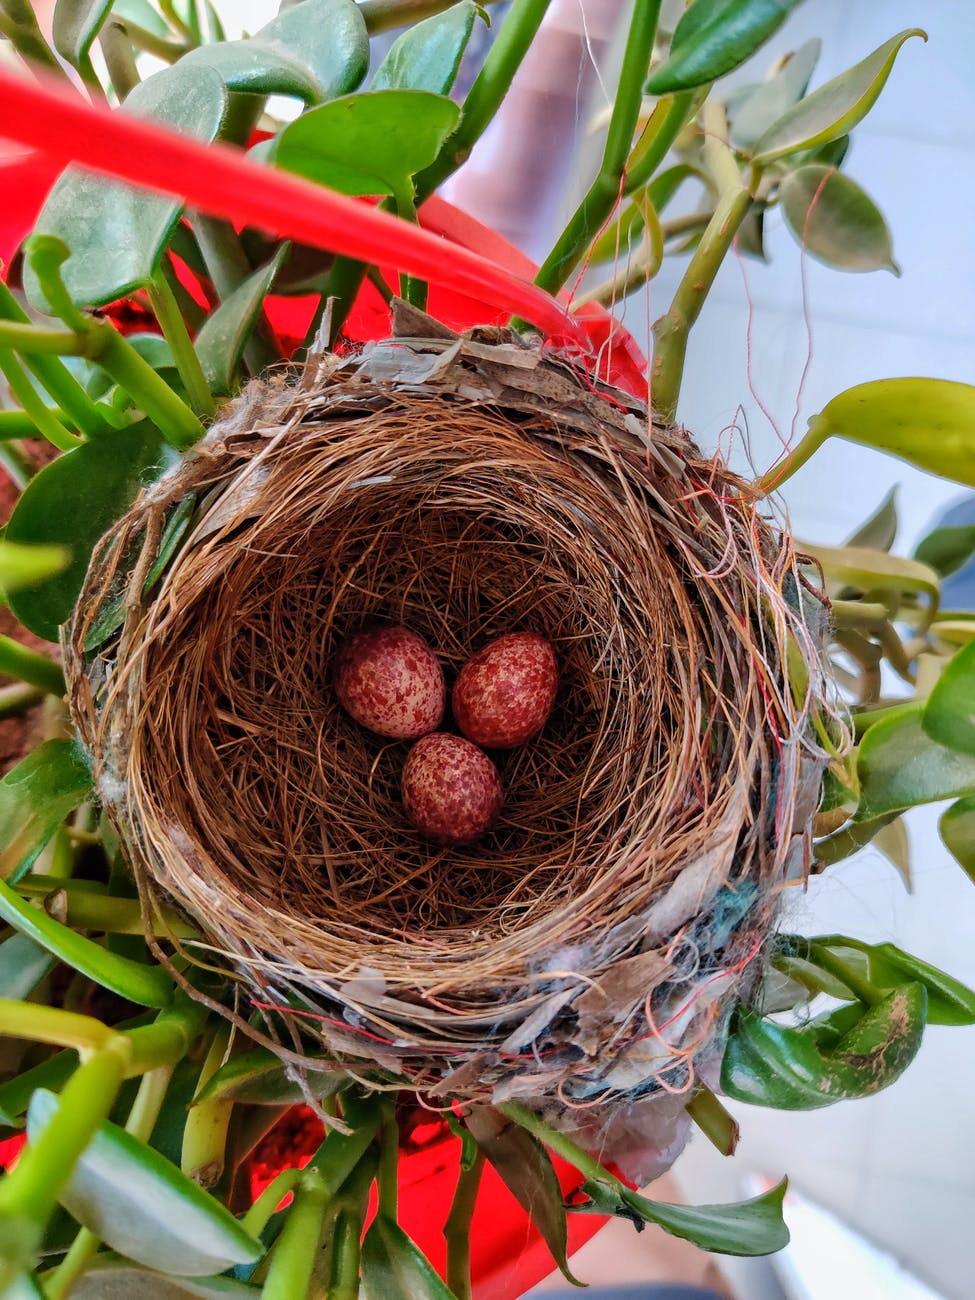 brown bird nest on green plant